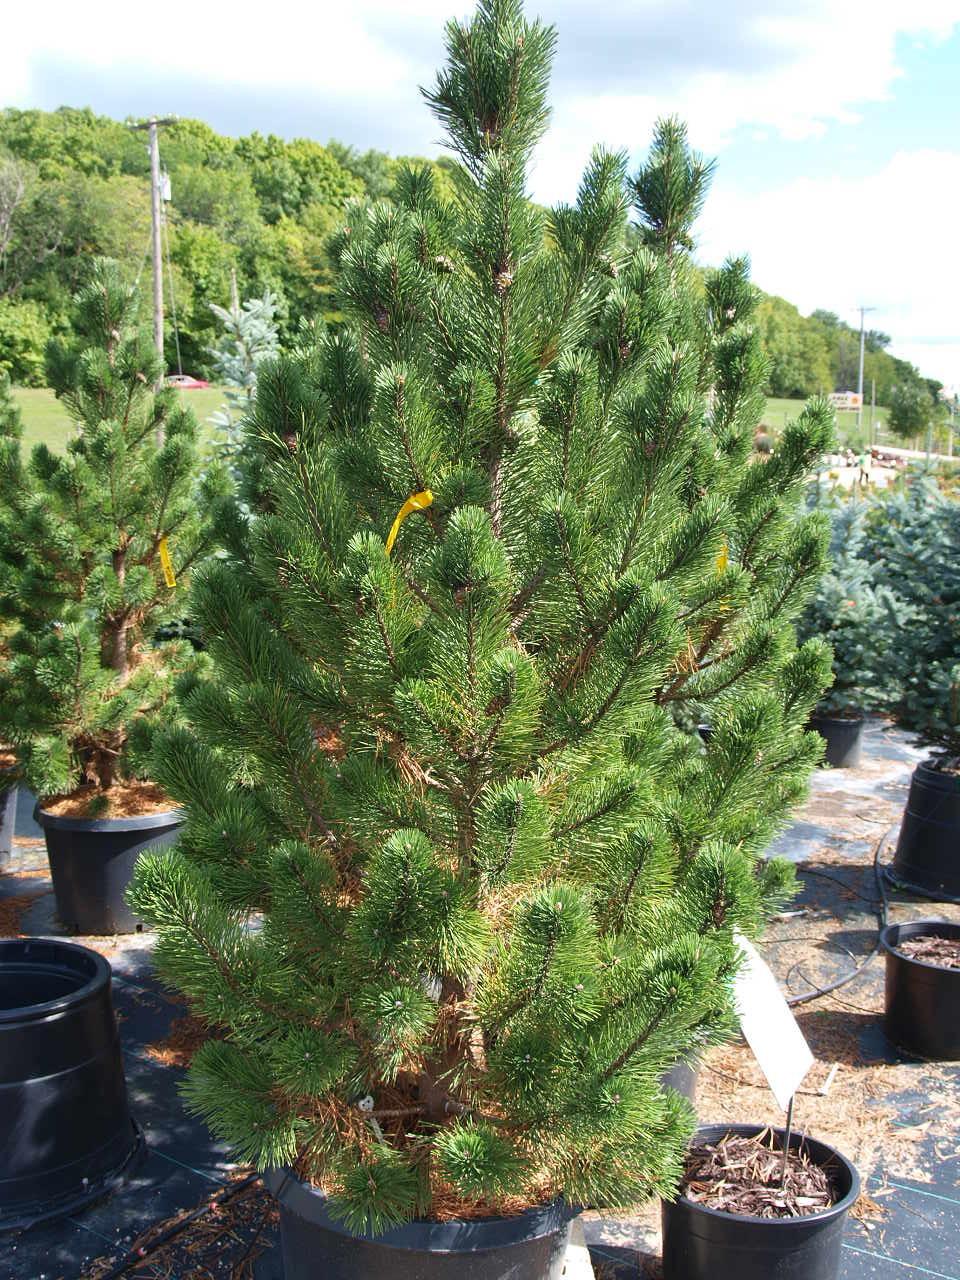 Tannebaum mugo pine knecht 39 s nurseries landscaping for Small sized evergreen trees